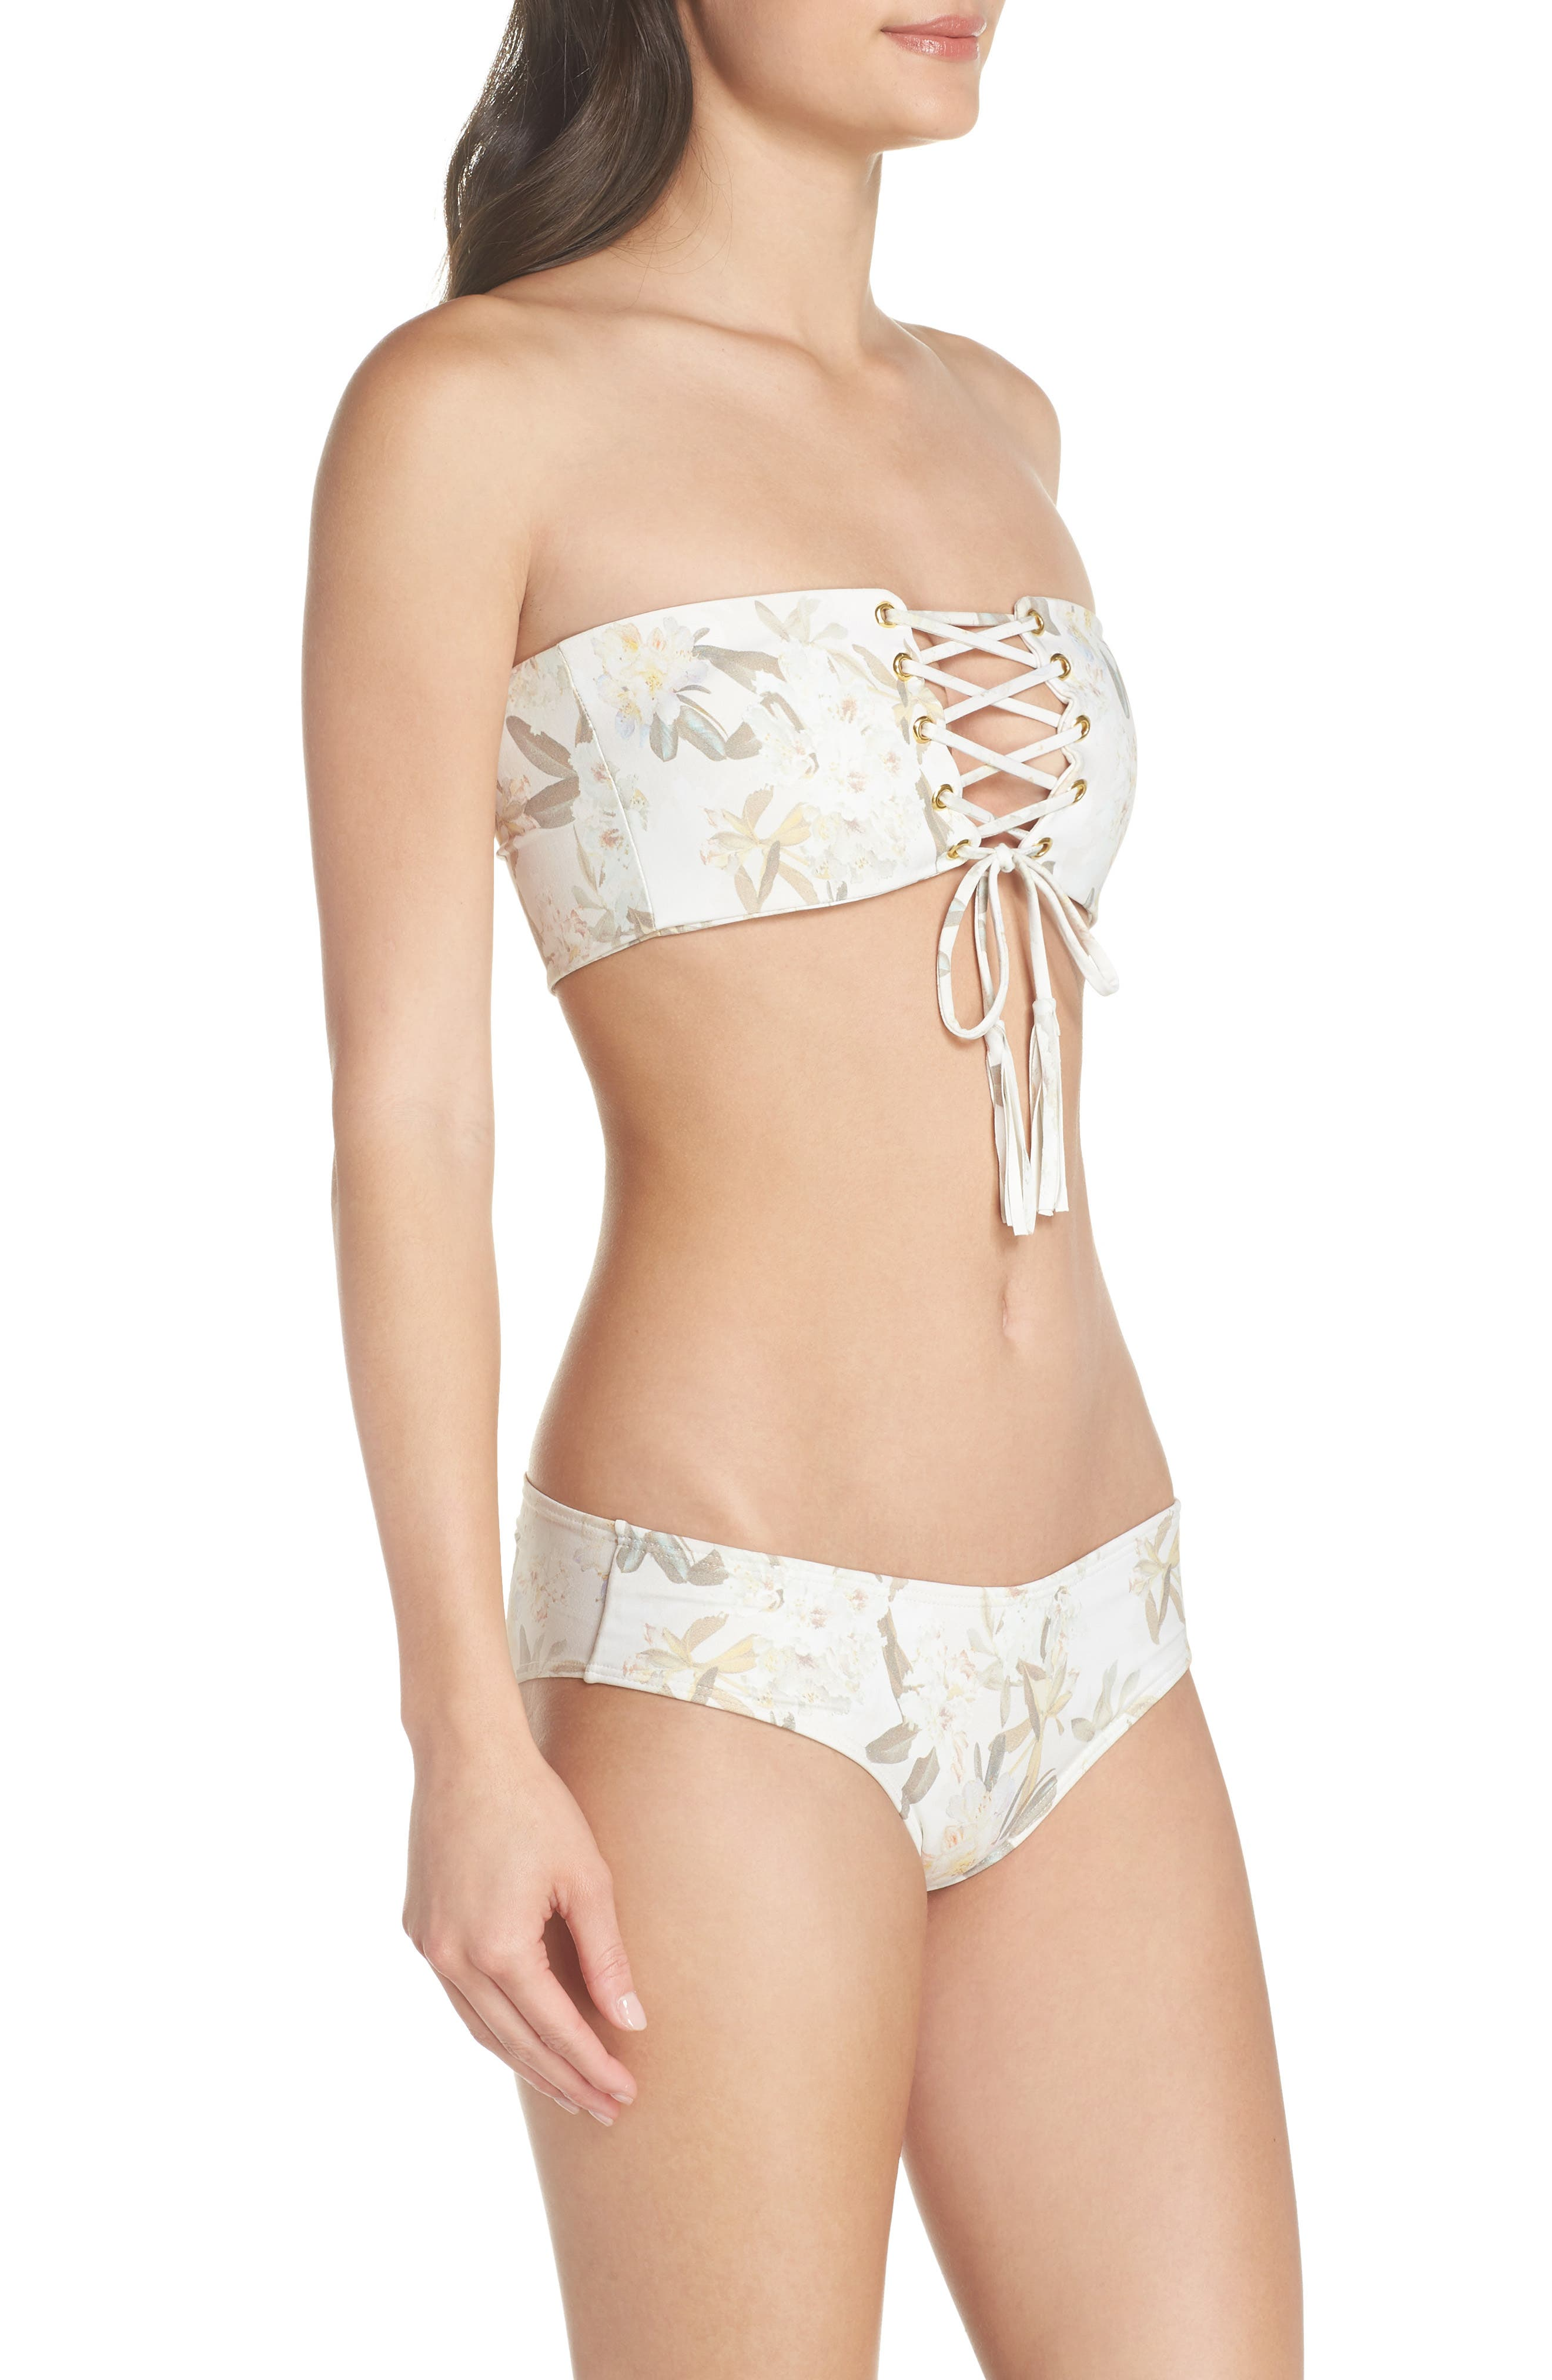 Floral Corset Bikini Top,                             Alternate thumbnail 9, color,                             ETE FLORAL WHITE